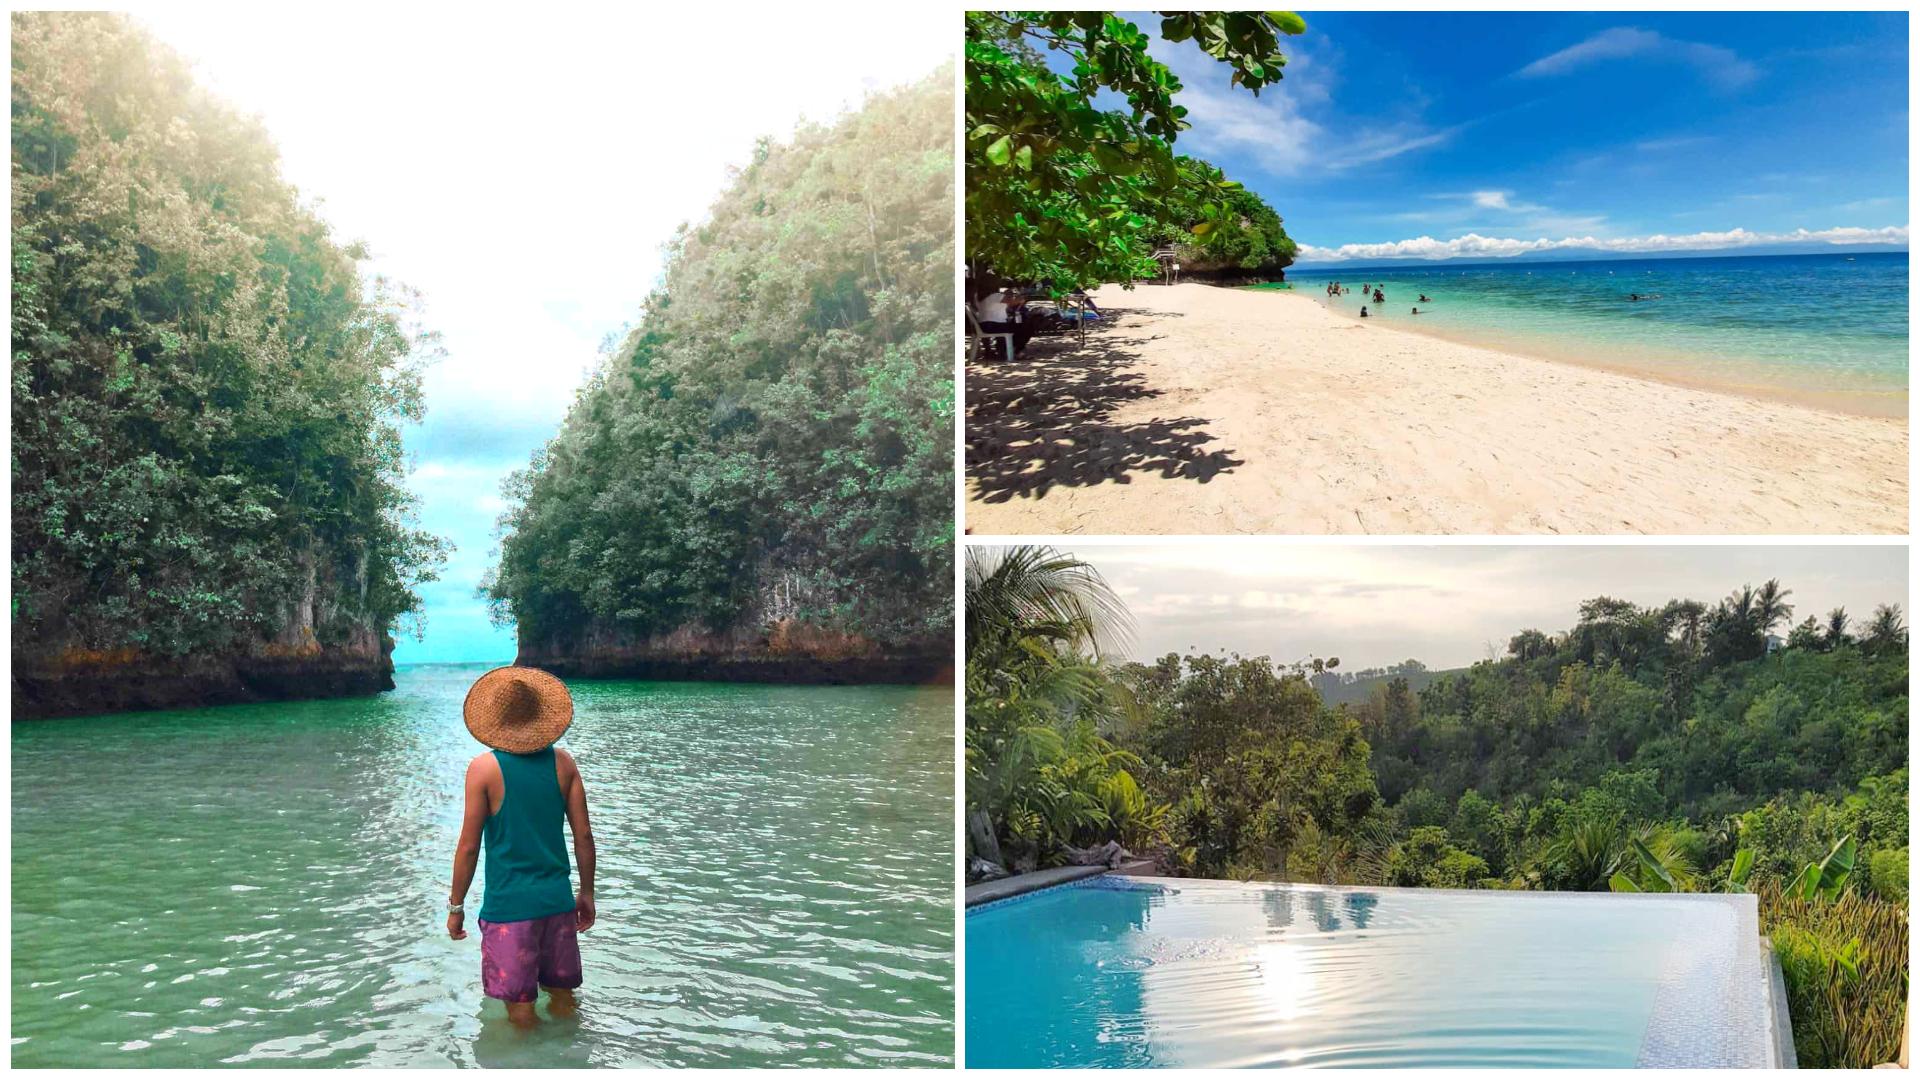 1 Attractions in Aloguinsan Cebu